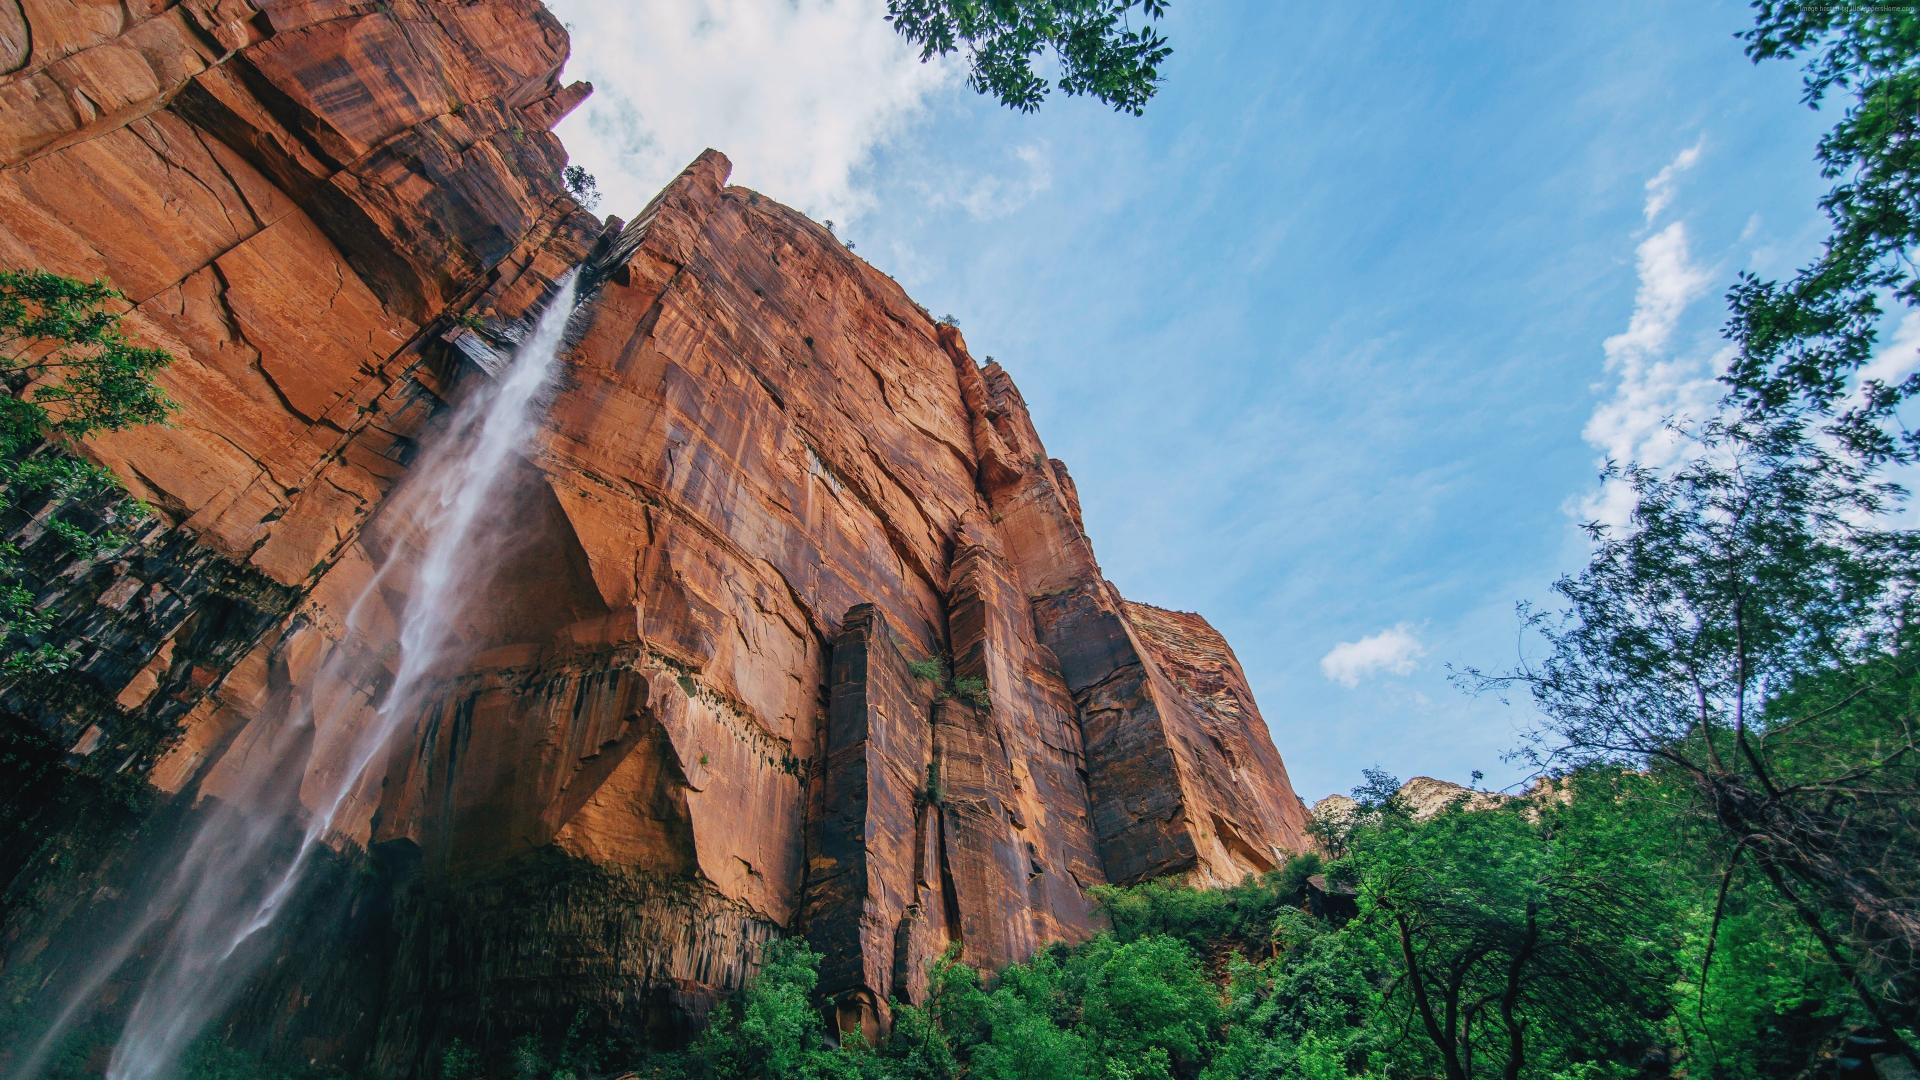 Download 1920x1080 Wallpaper Yosemite Falls Waterfall